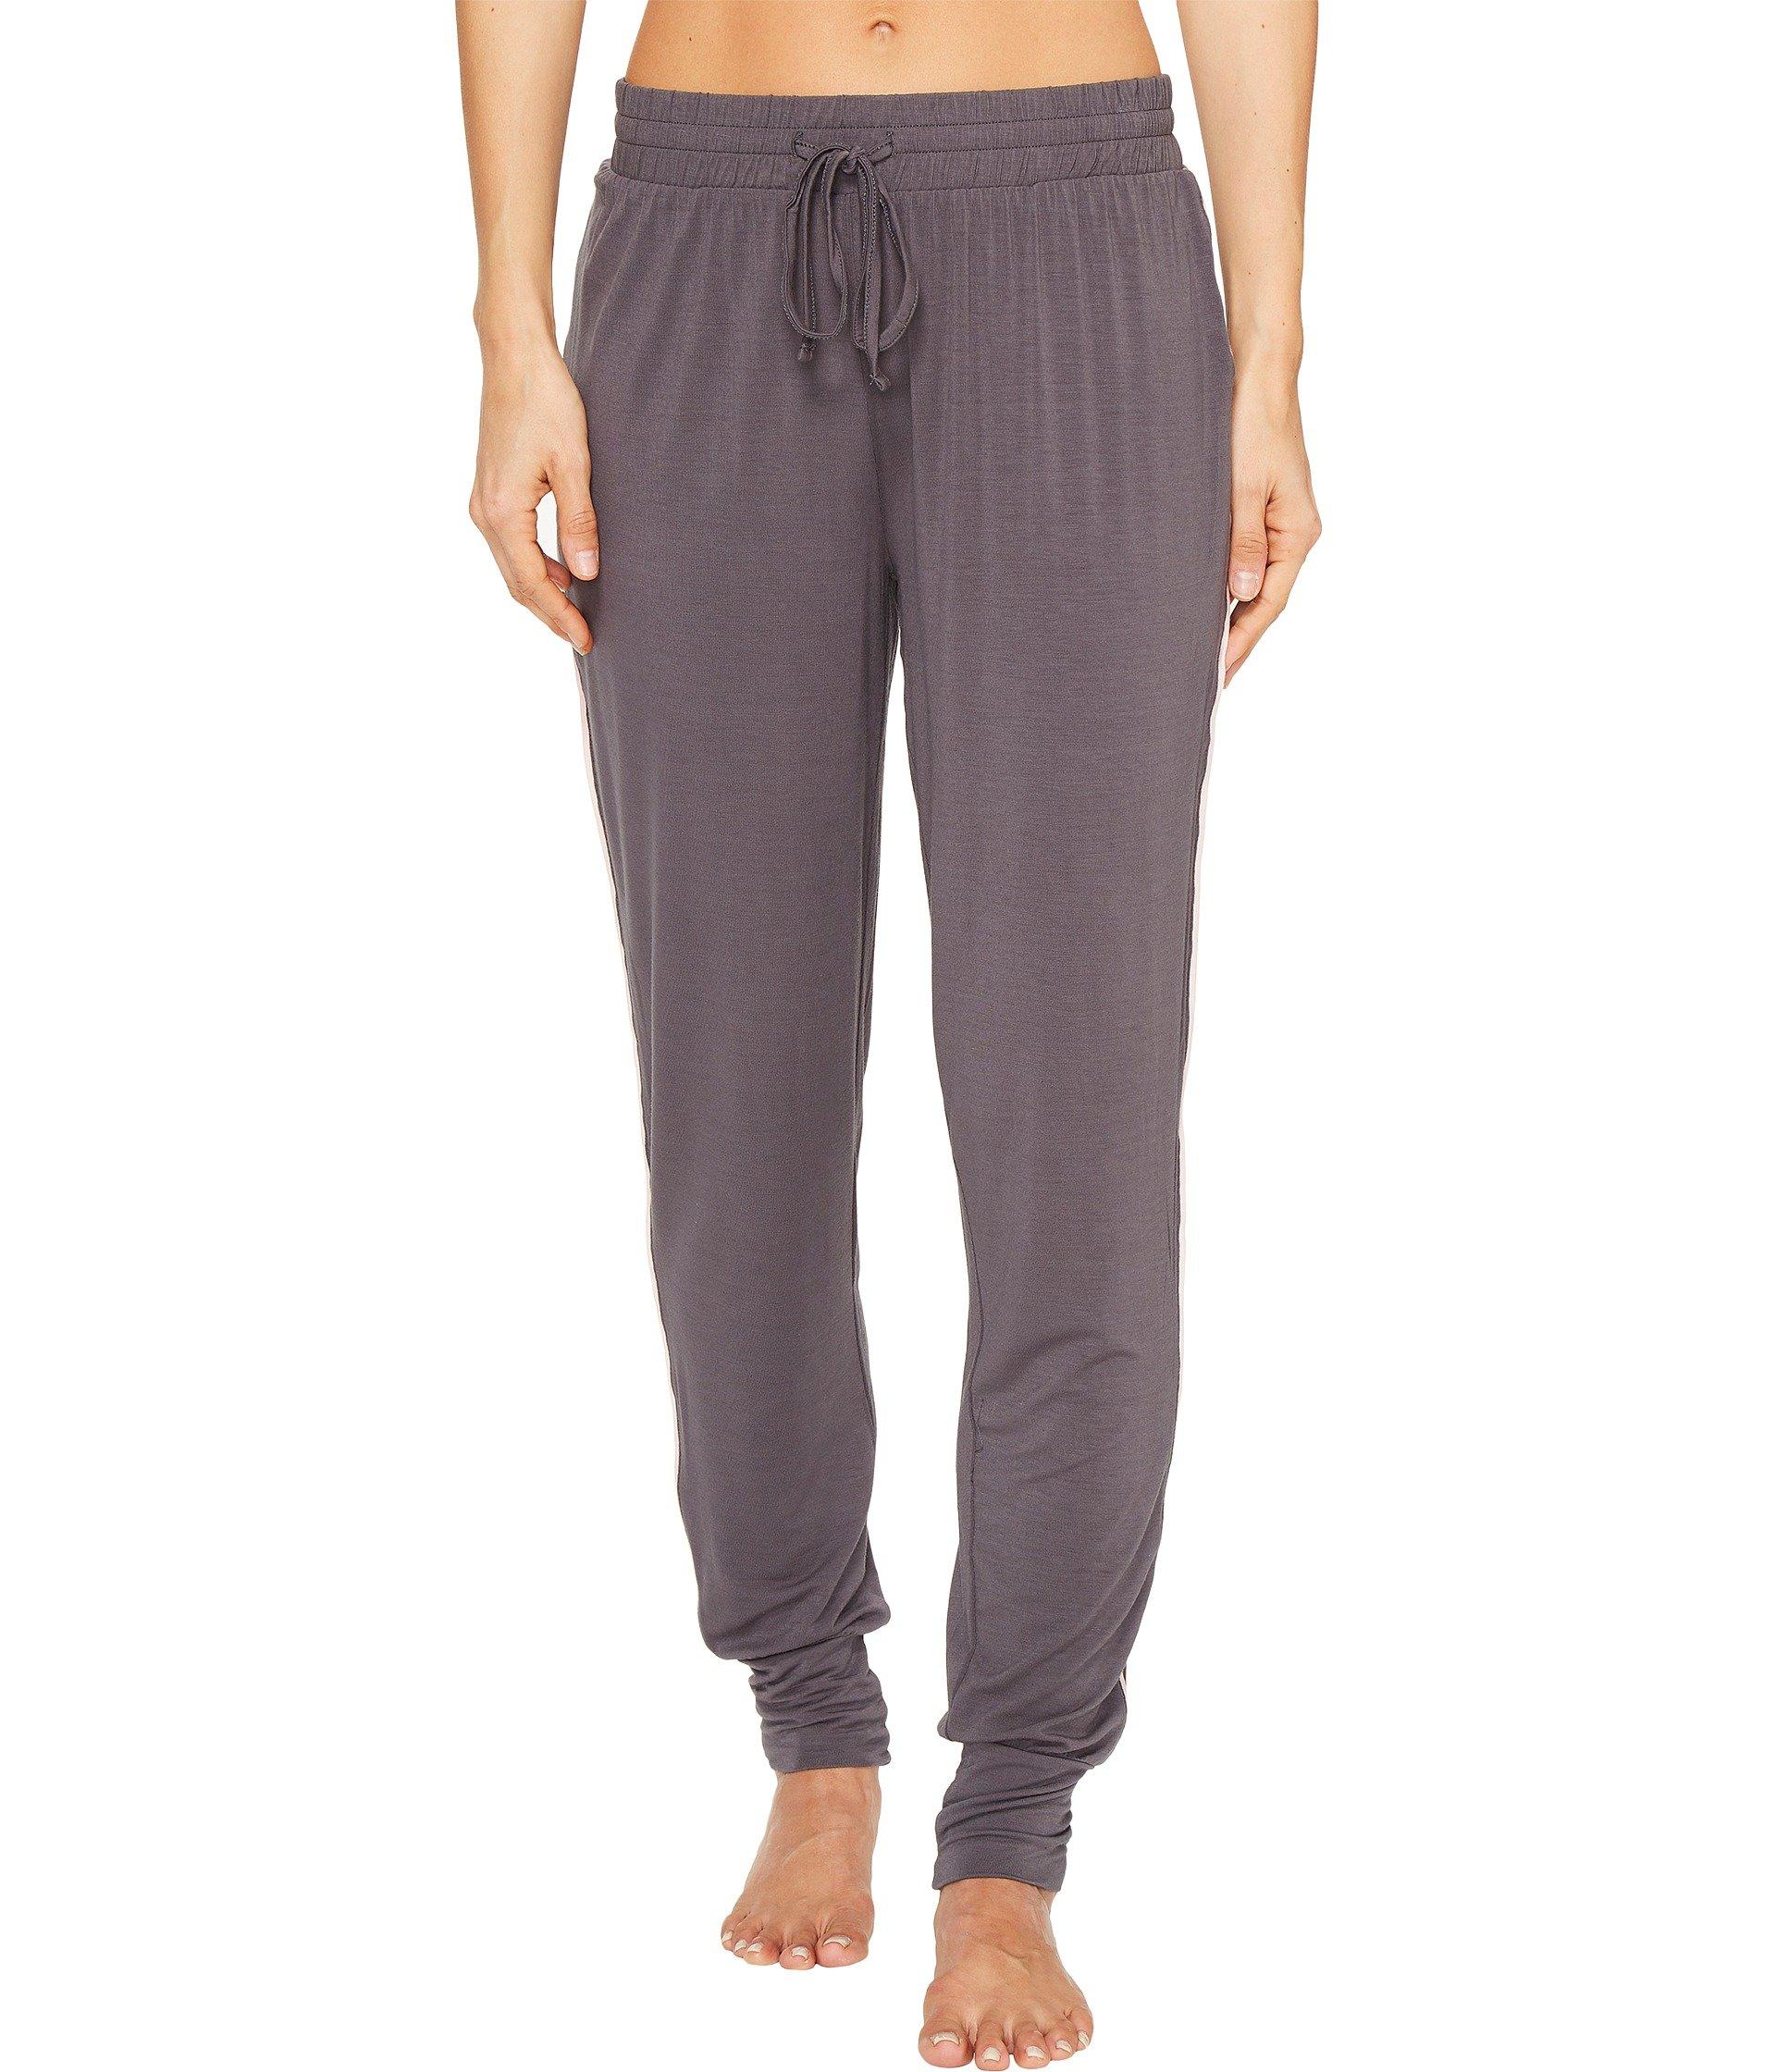 Pantalón de Pijama para Mujer P.J. Salvage Take Flight Jogger Pants  + P.J. Salvage en VeoyCompro.net